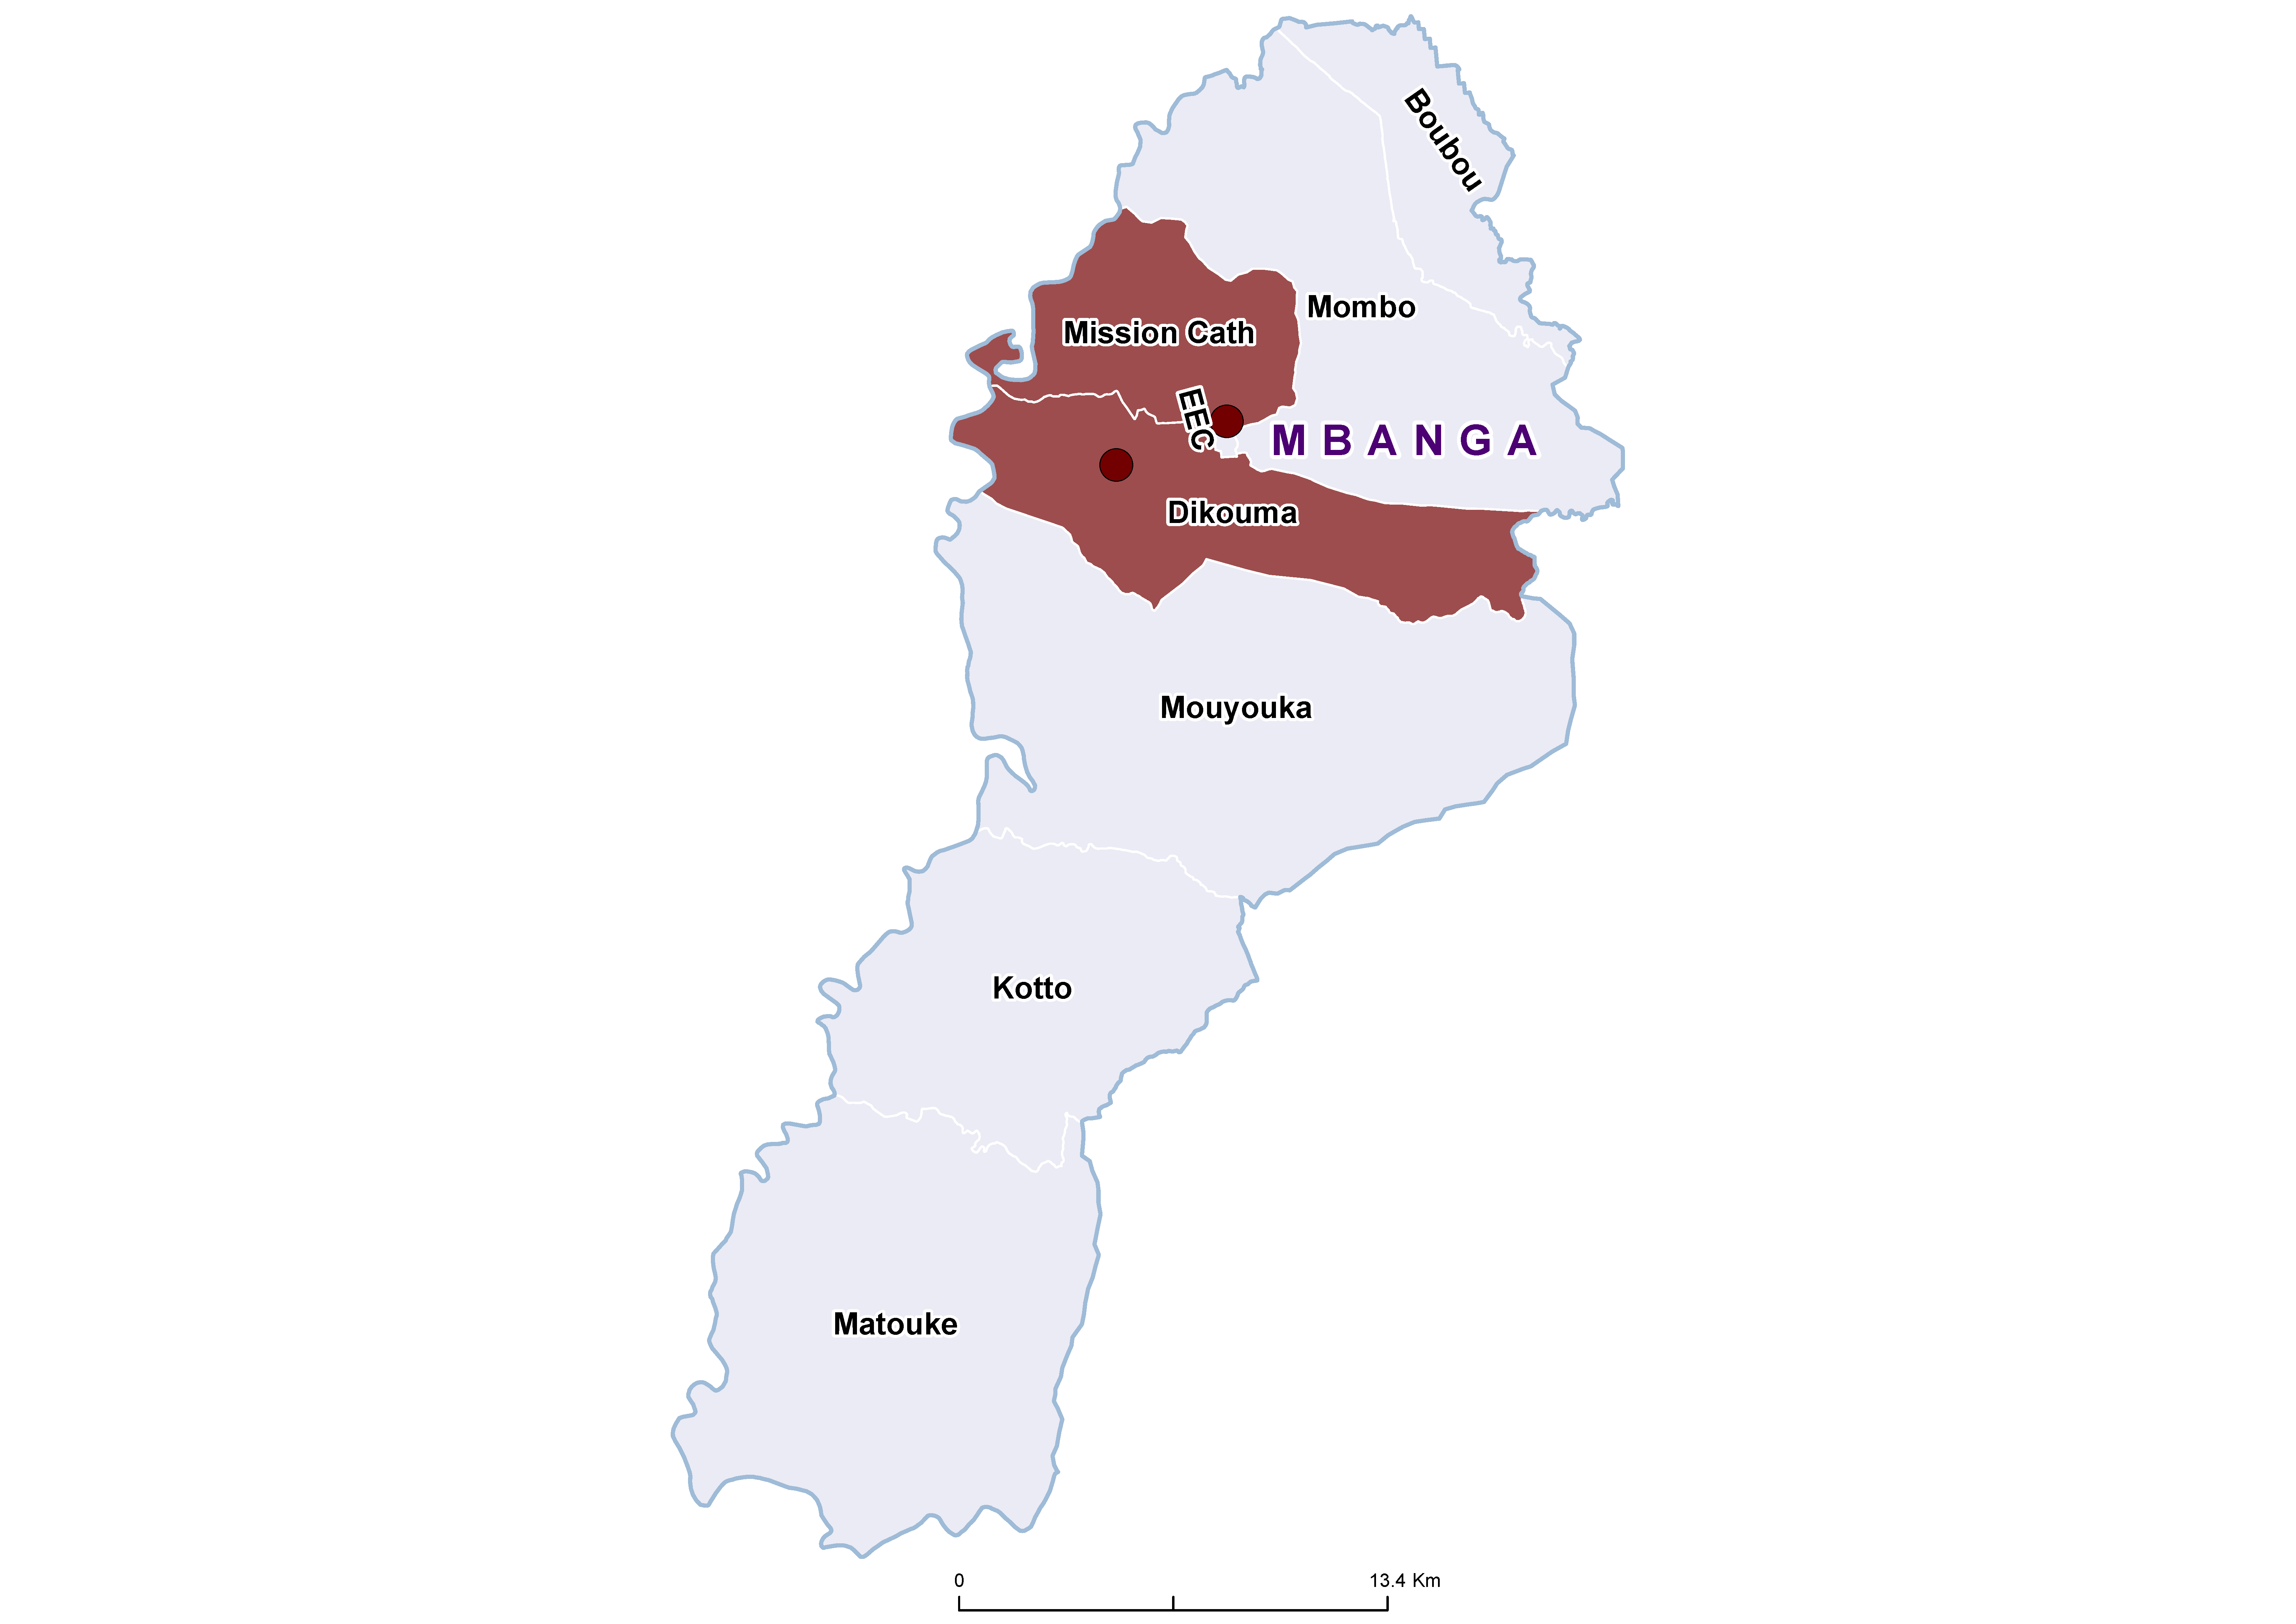 Mbanga STH 19850001